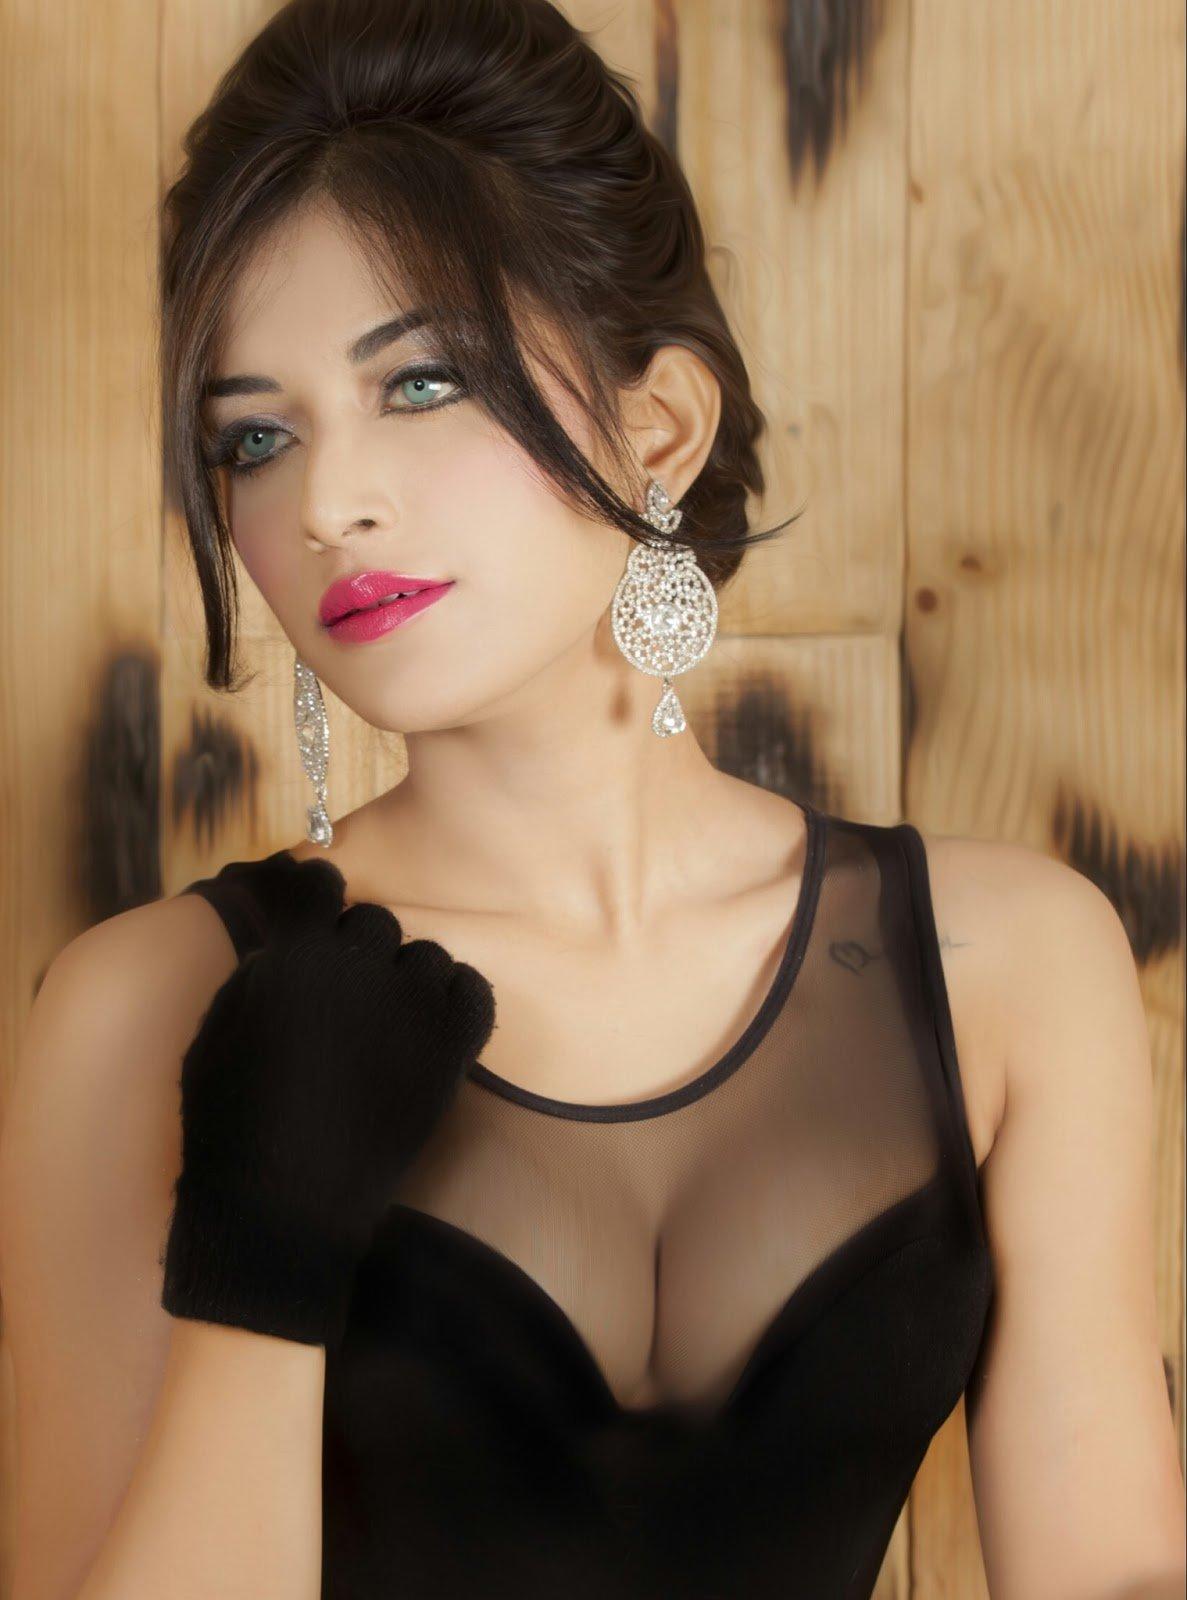 angela krislinzki ,angela krislinzki hot photos,angela krislinzki telugu actress, telugu actress,hot celebs